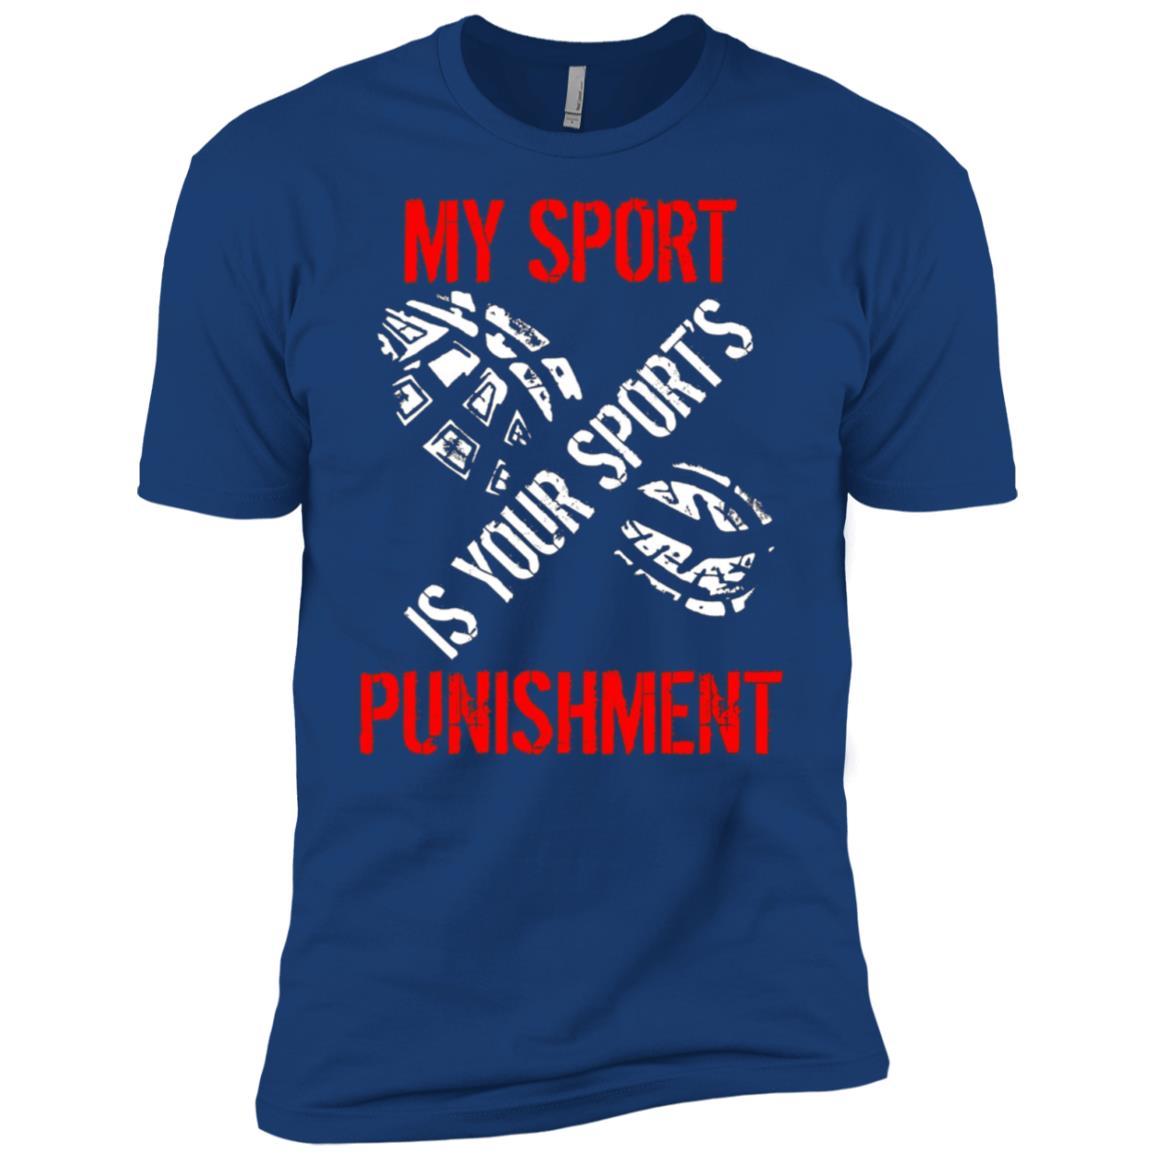 My Sport Is Your Sport's Punishment Funny Running Men Short Sleeve T-Shirt